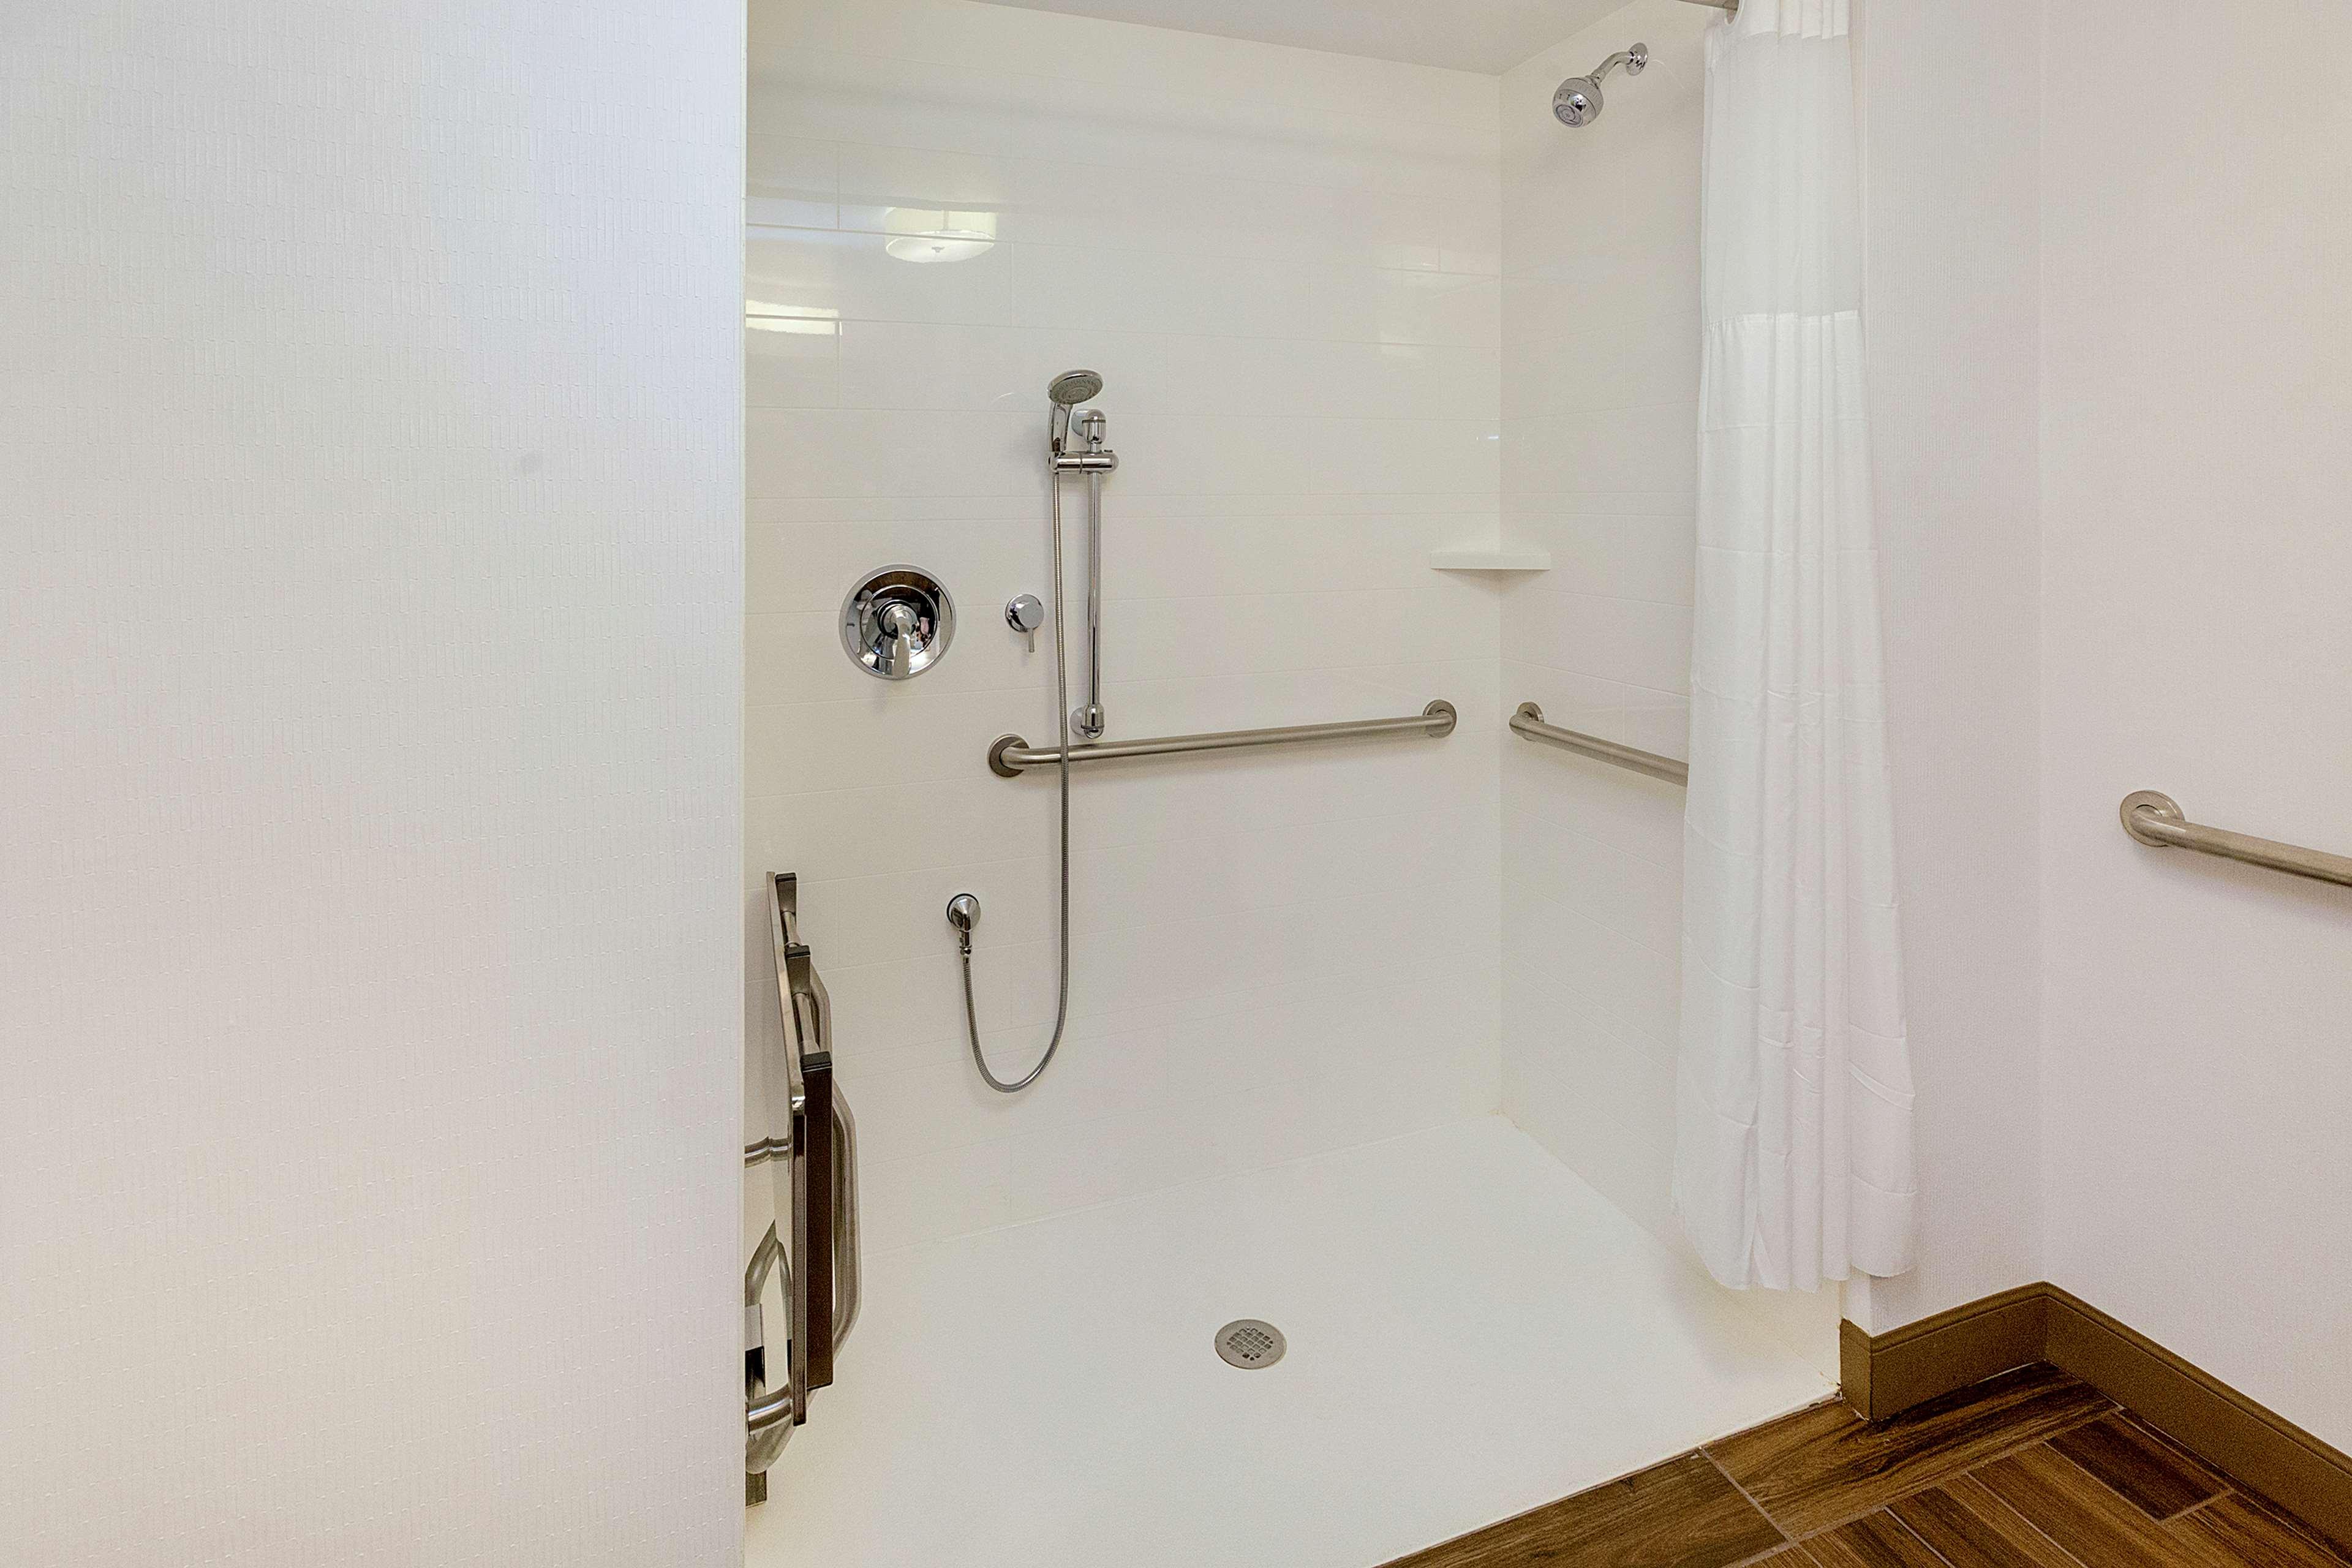 Hampton Inn & Suites Morgantown / University Town Centre image 19